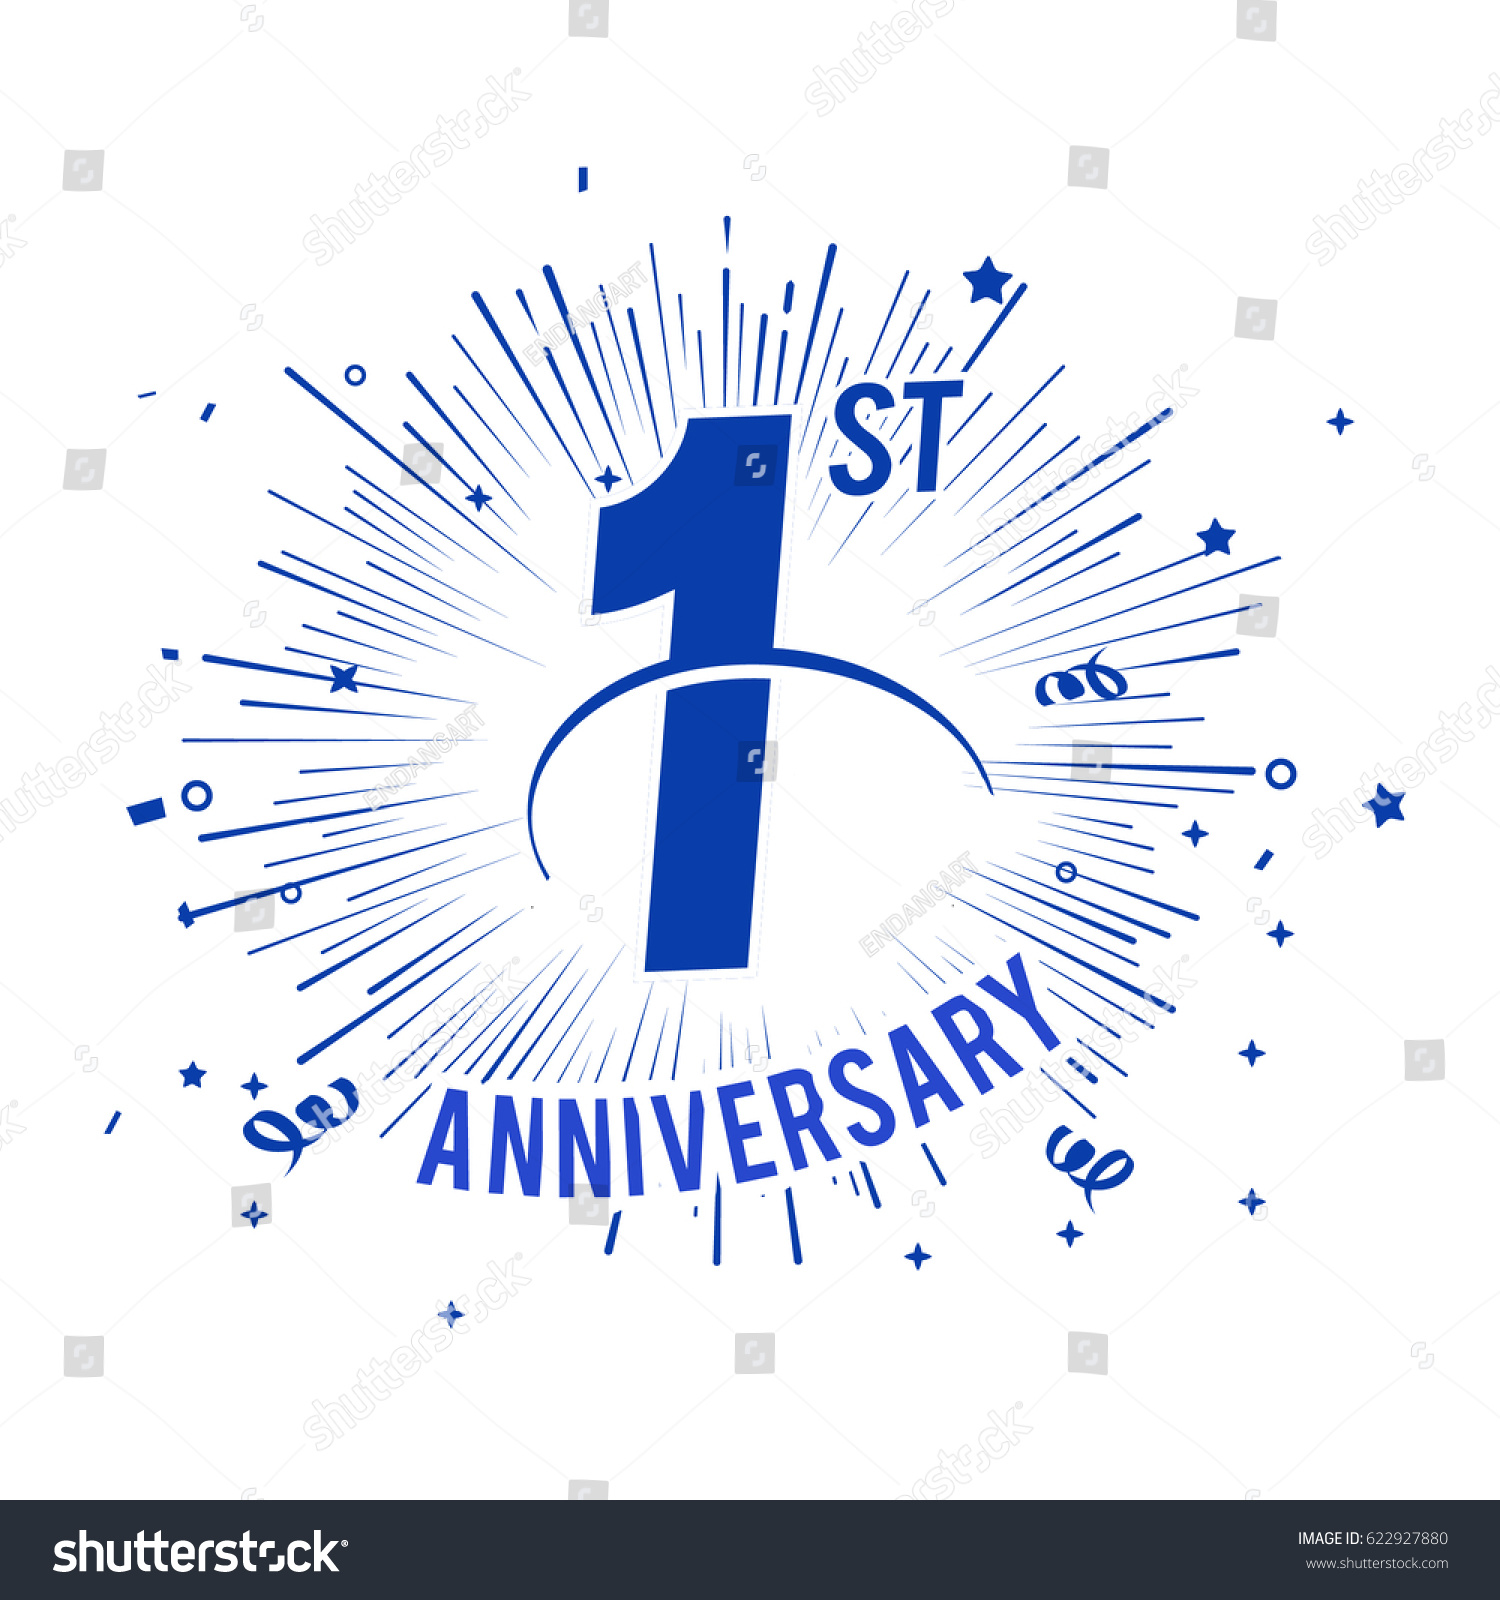 St anniversary logo firework swoosh stock vector